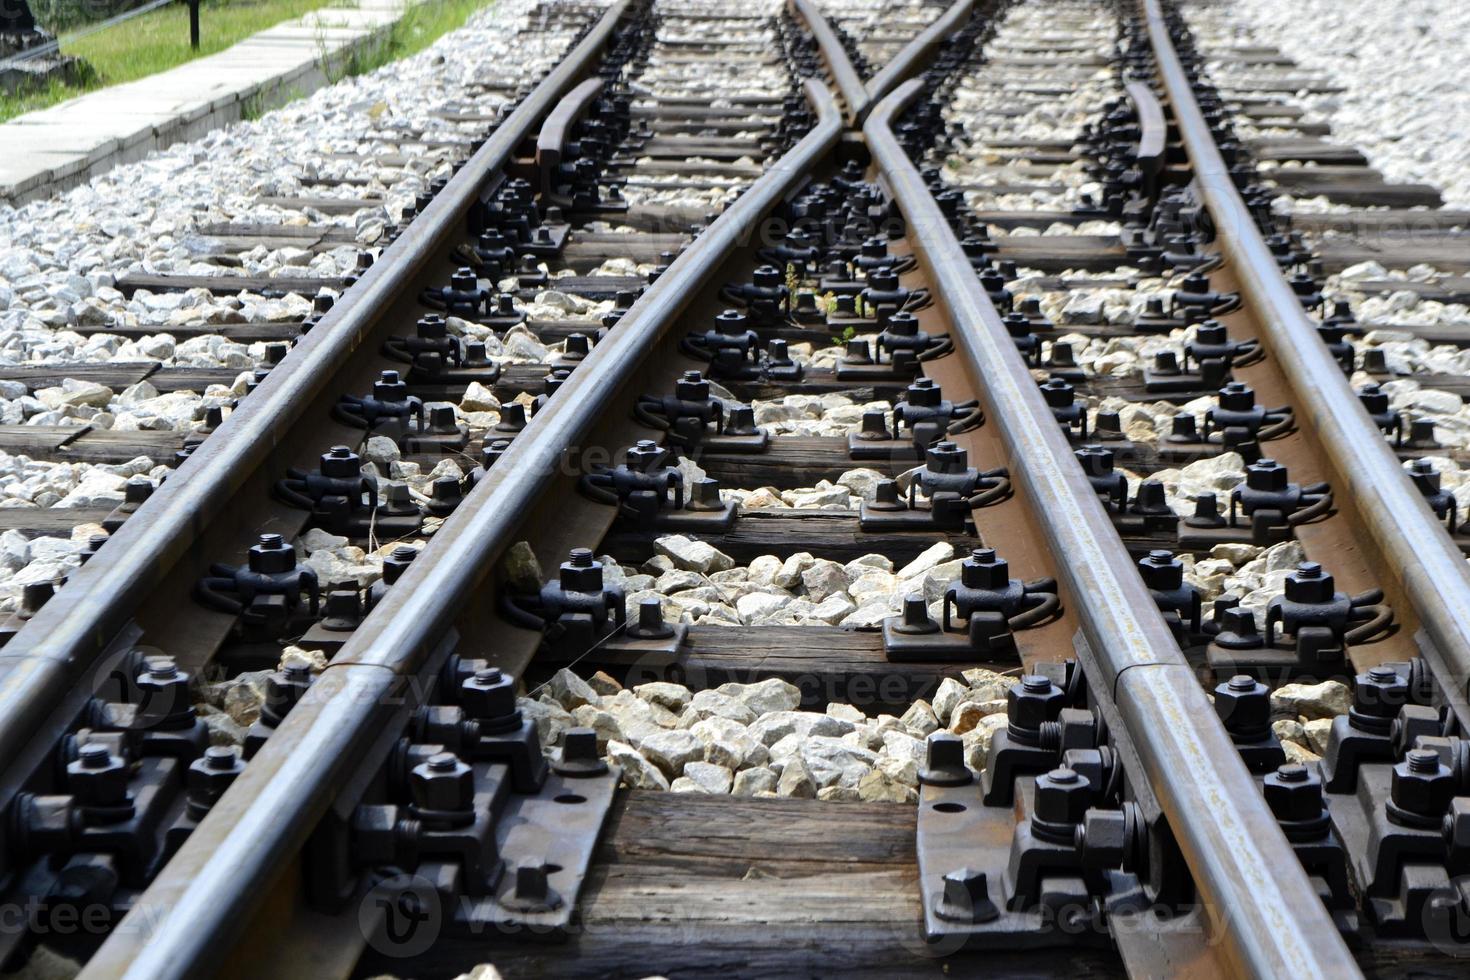 travessia ferroviária foto